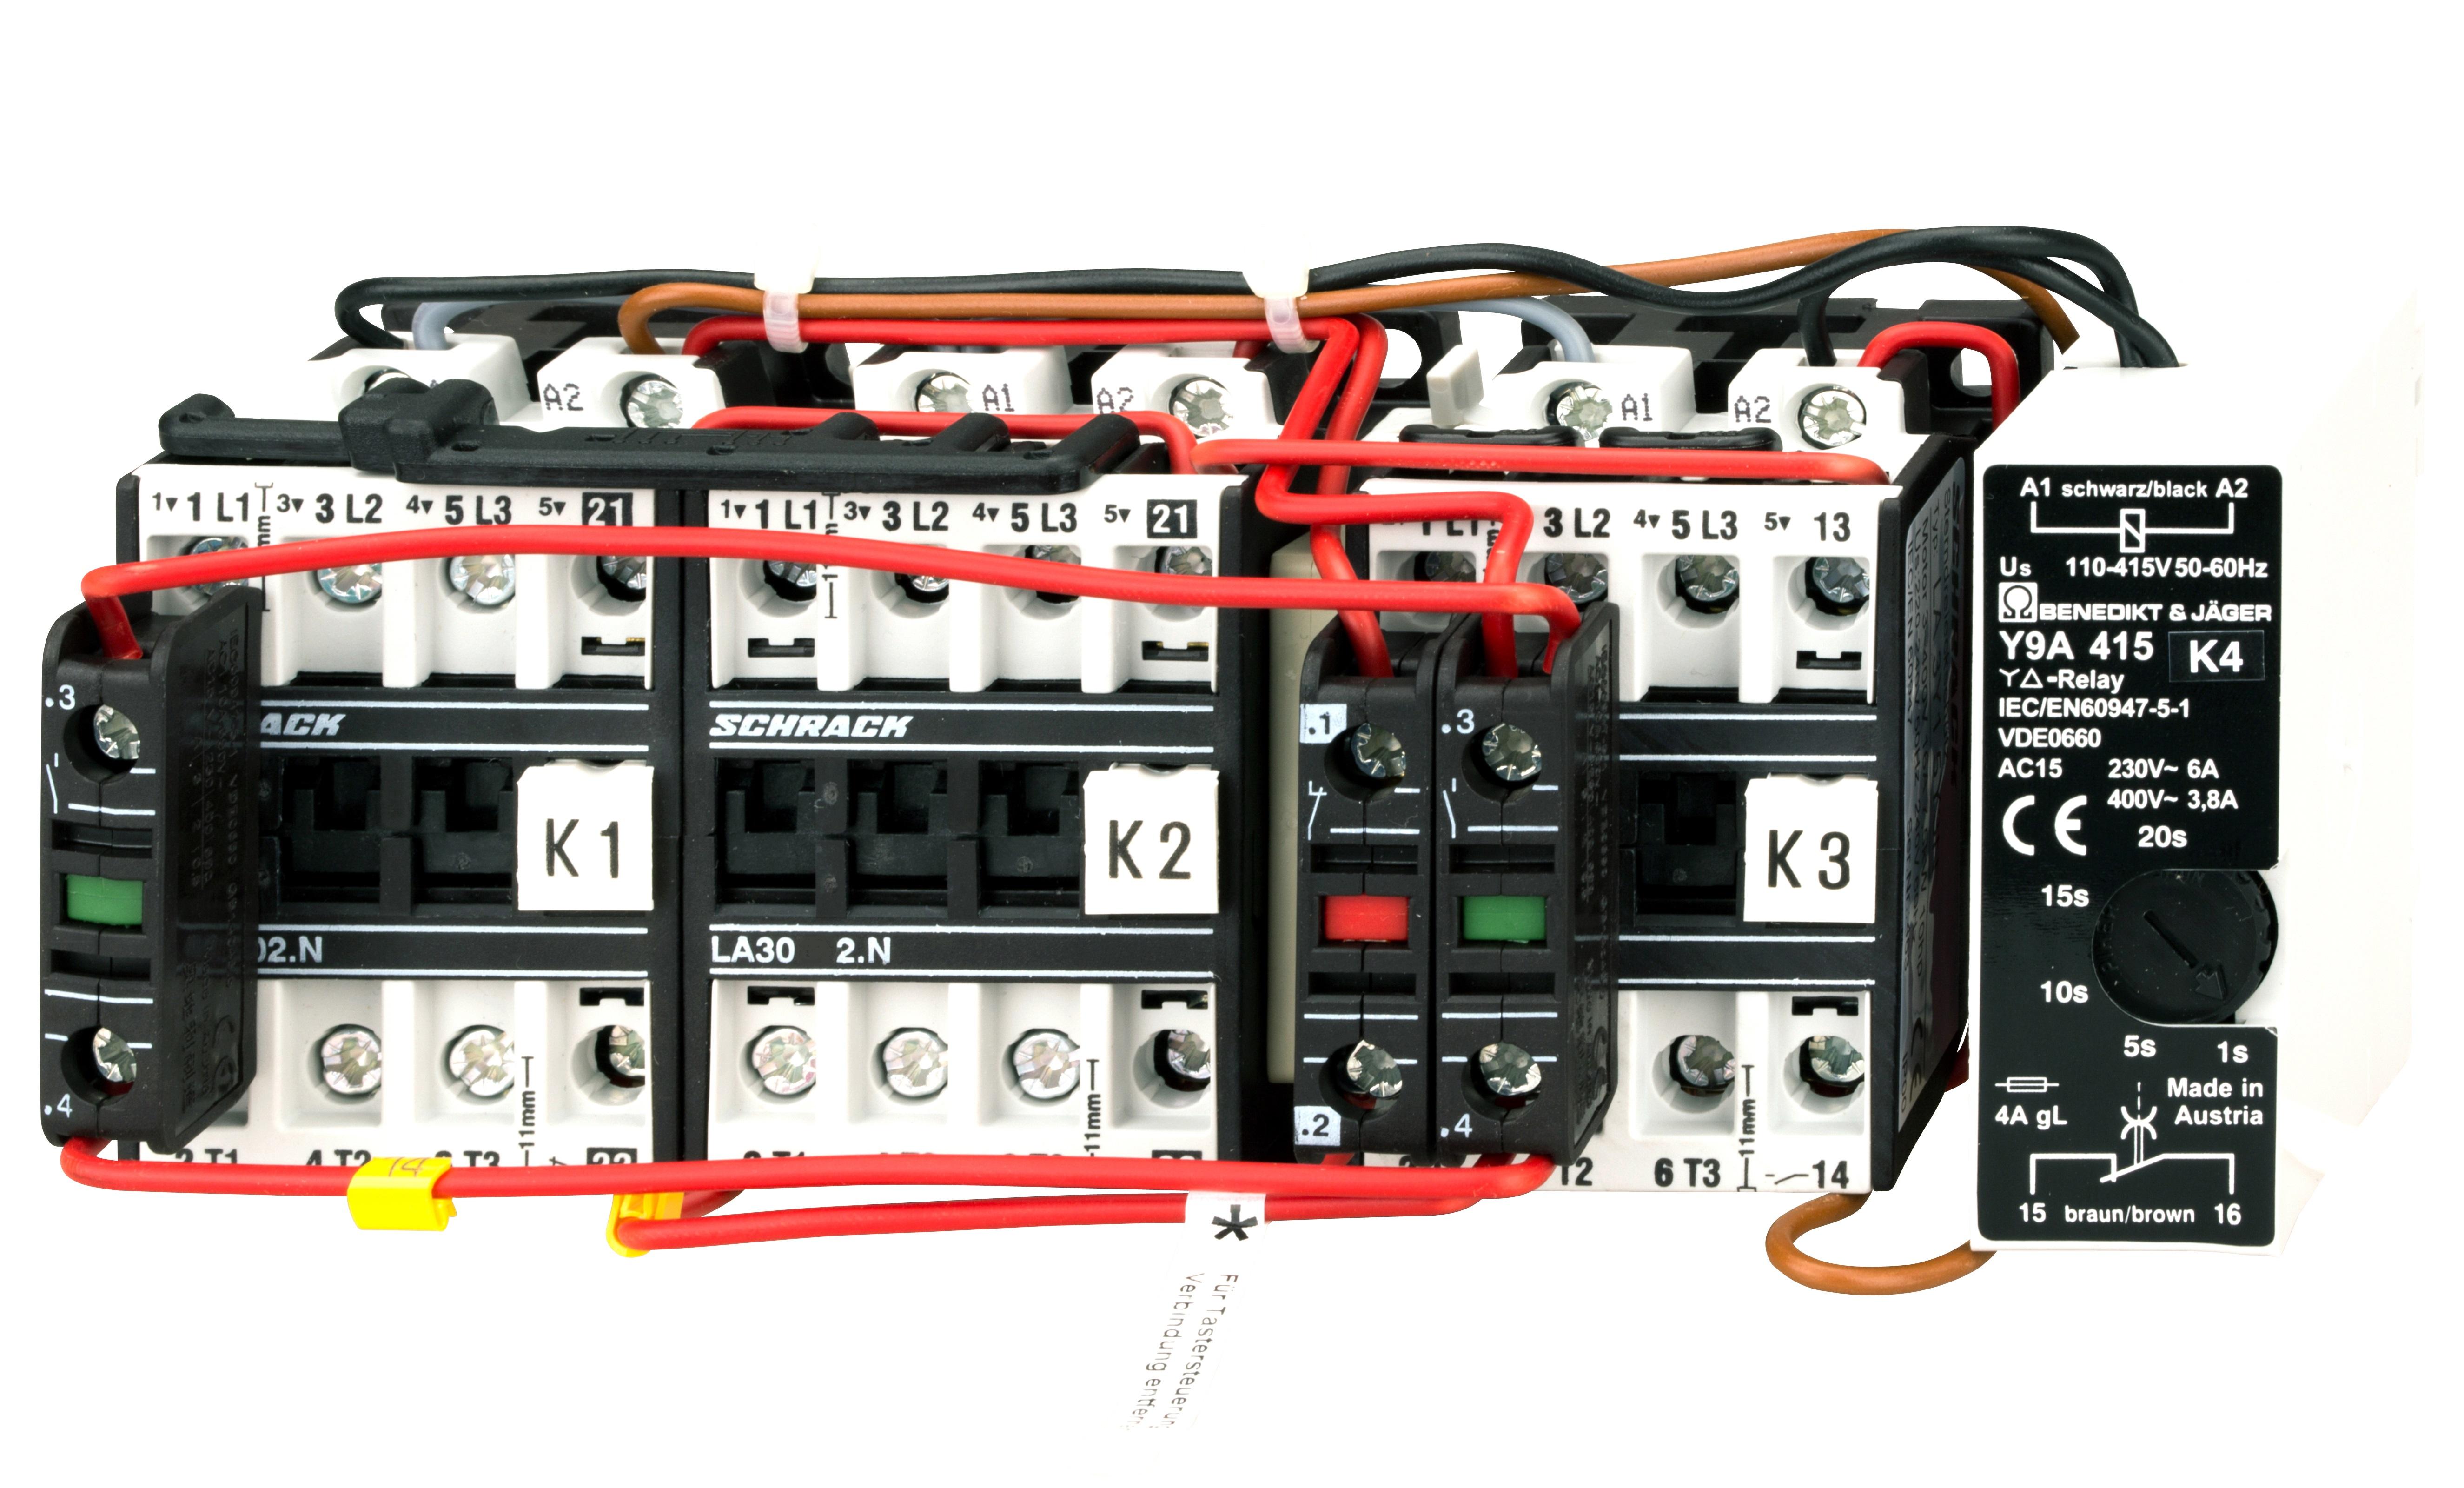 1 Stk Stern-Dreieck-Schützkombination 85A, 45kW, 230VAC LA3Y80Y3--